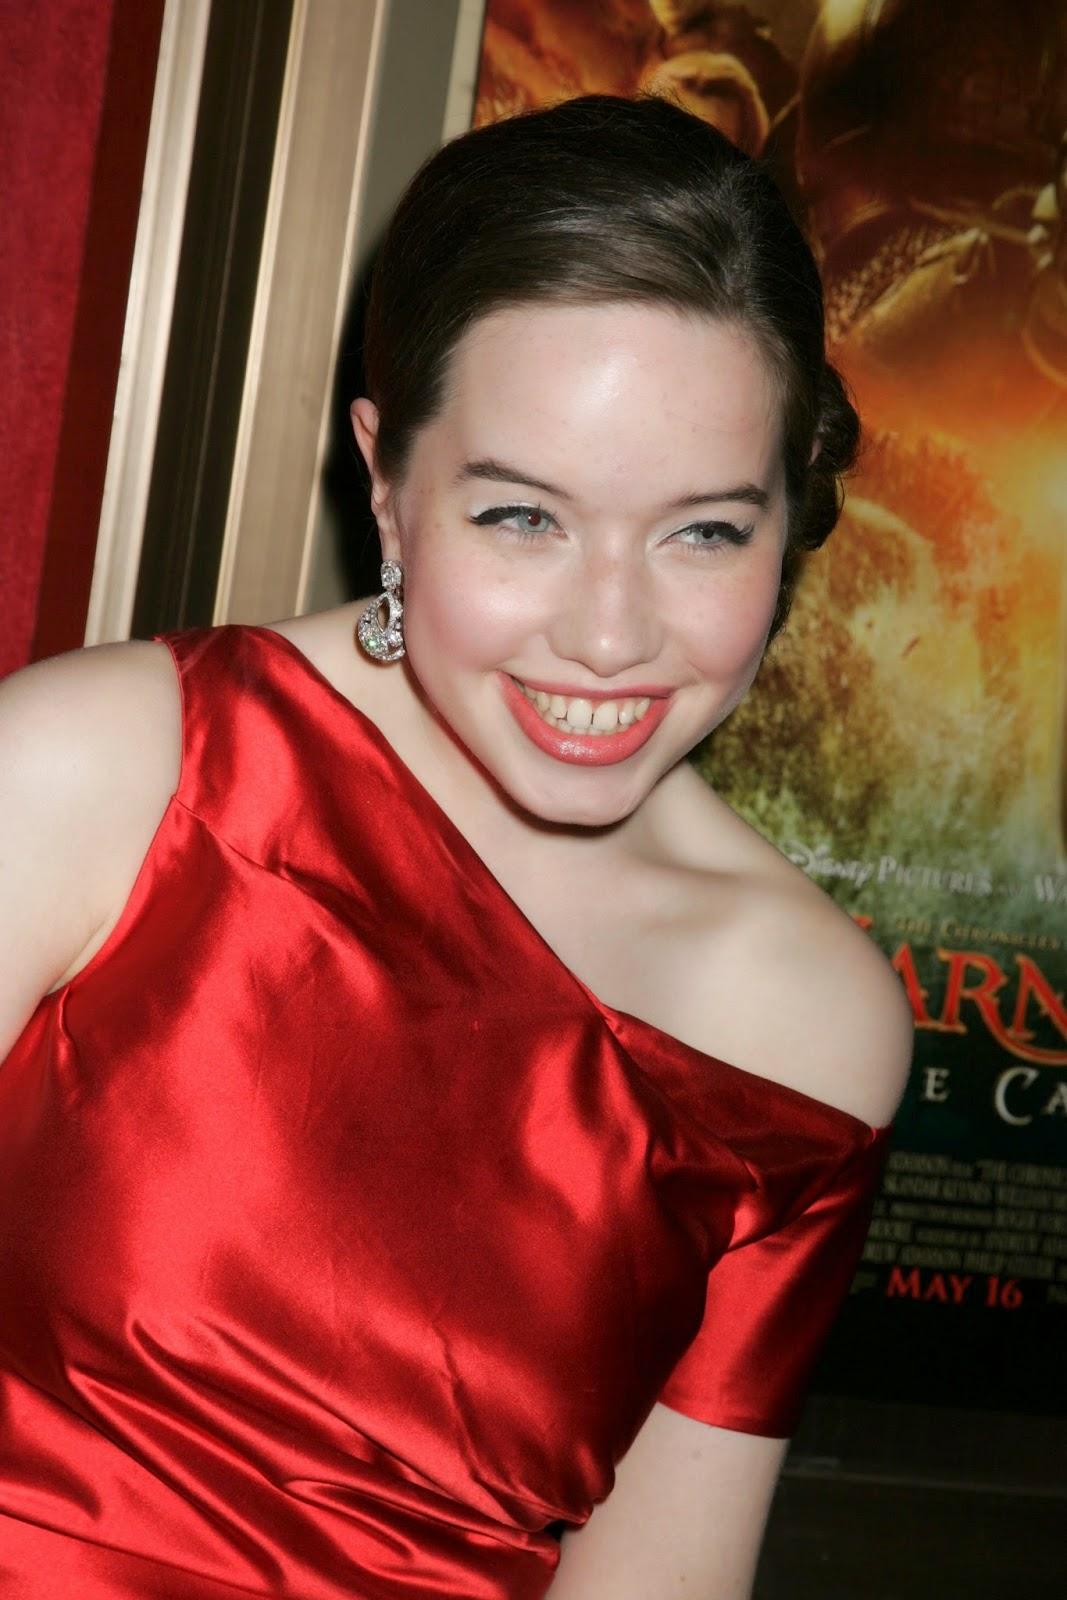 World Hot Actress: Anna Popplewell English film